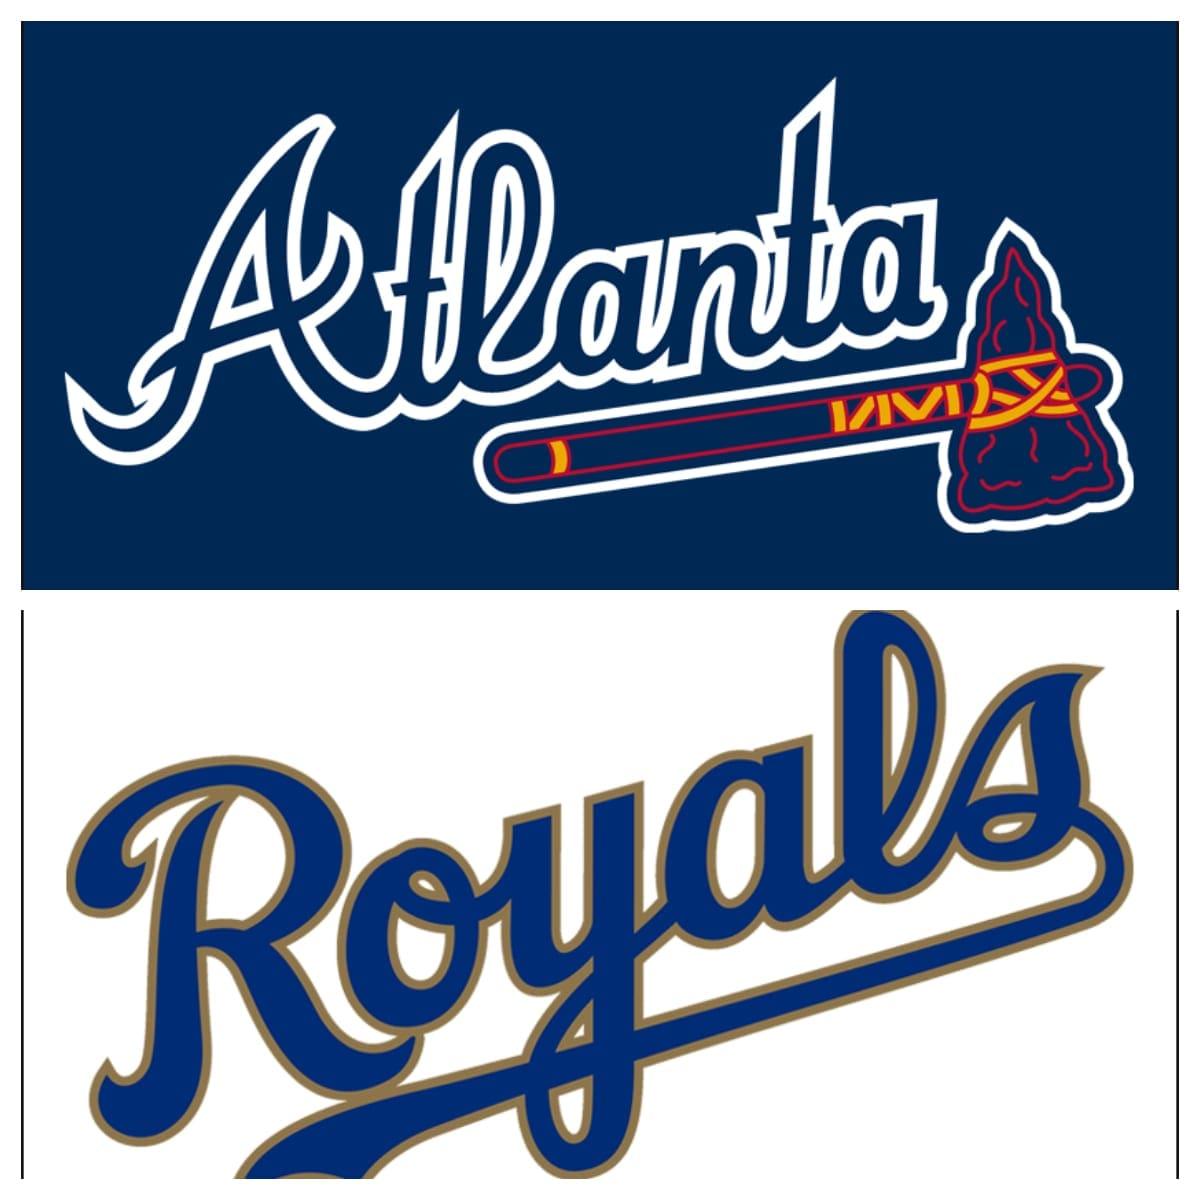 Atlanta Braves vs Kansas City Royals Stats